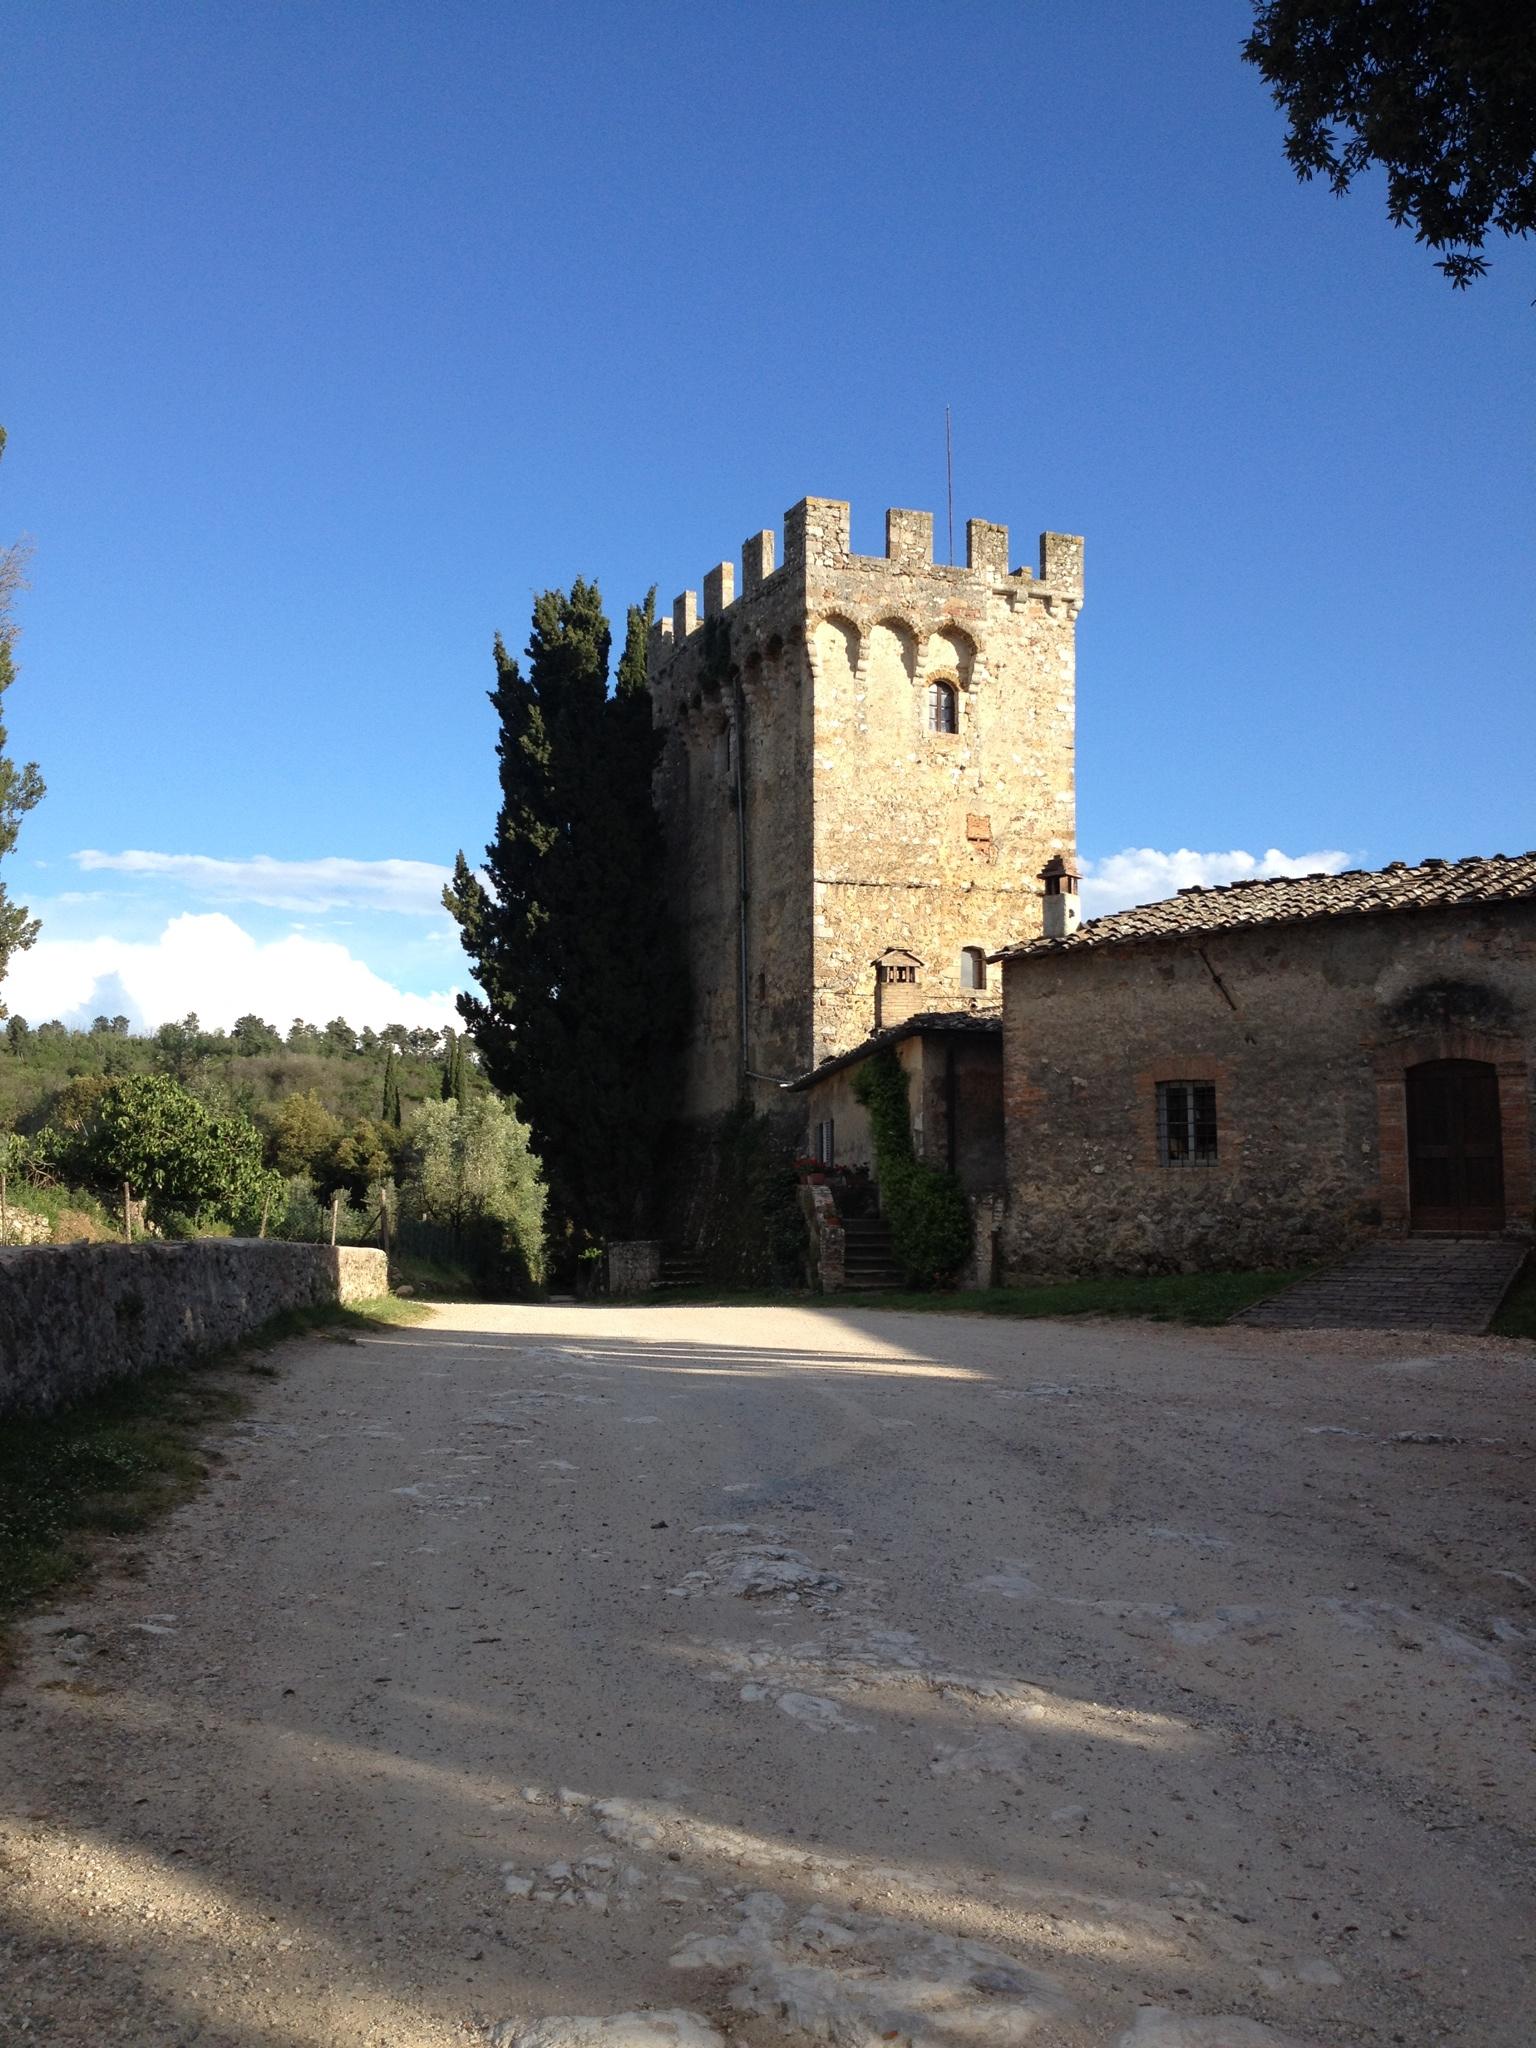 The keep at Spannocchia